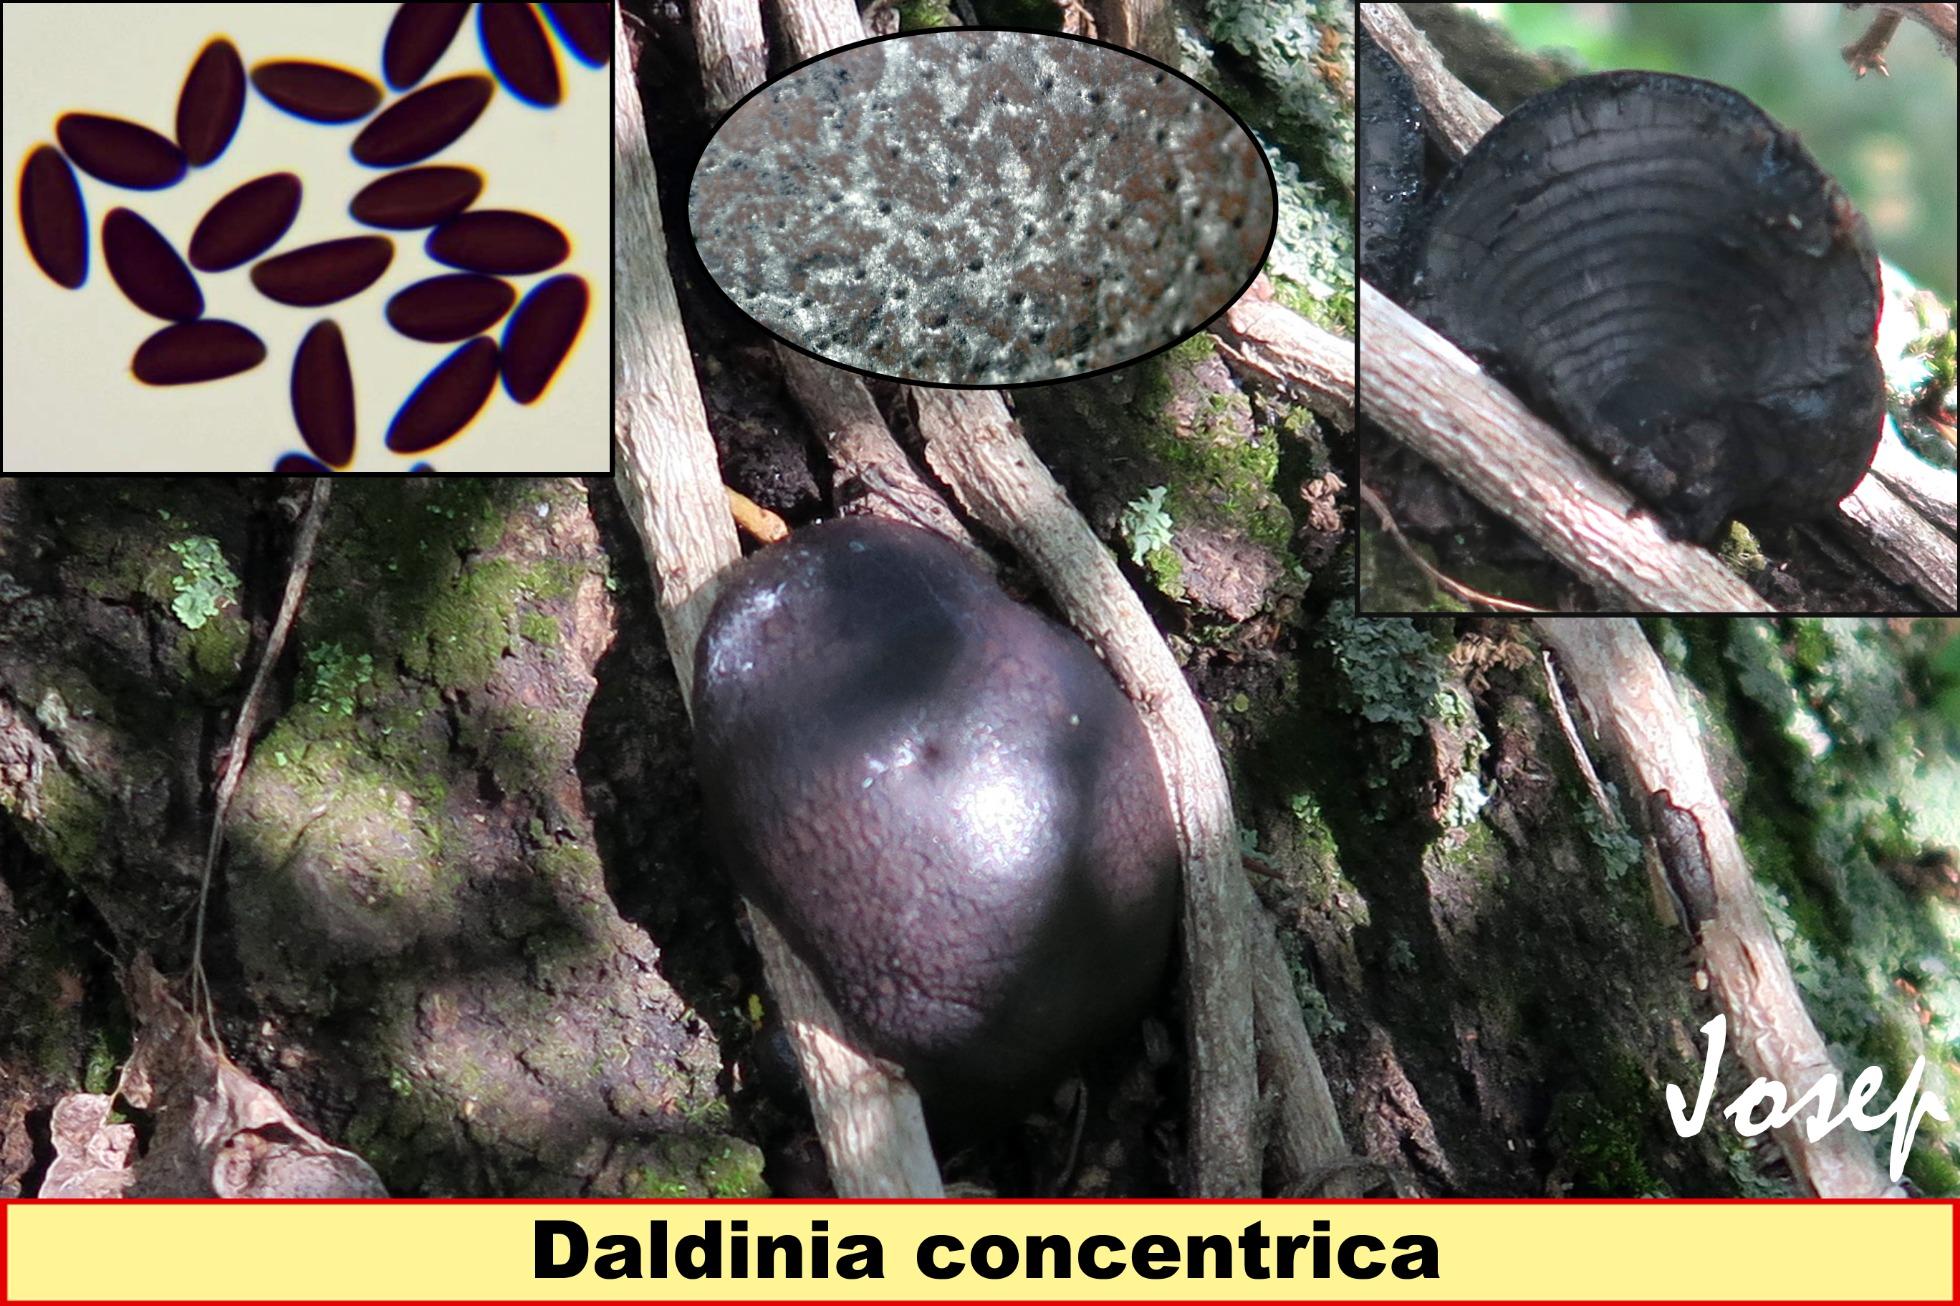 Daldiniaconcentrica_2019-03-06.jpg